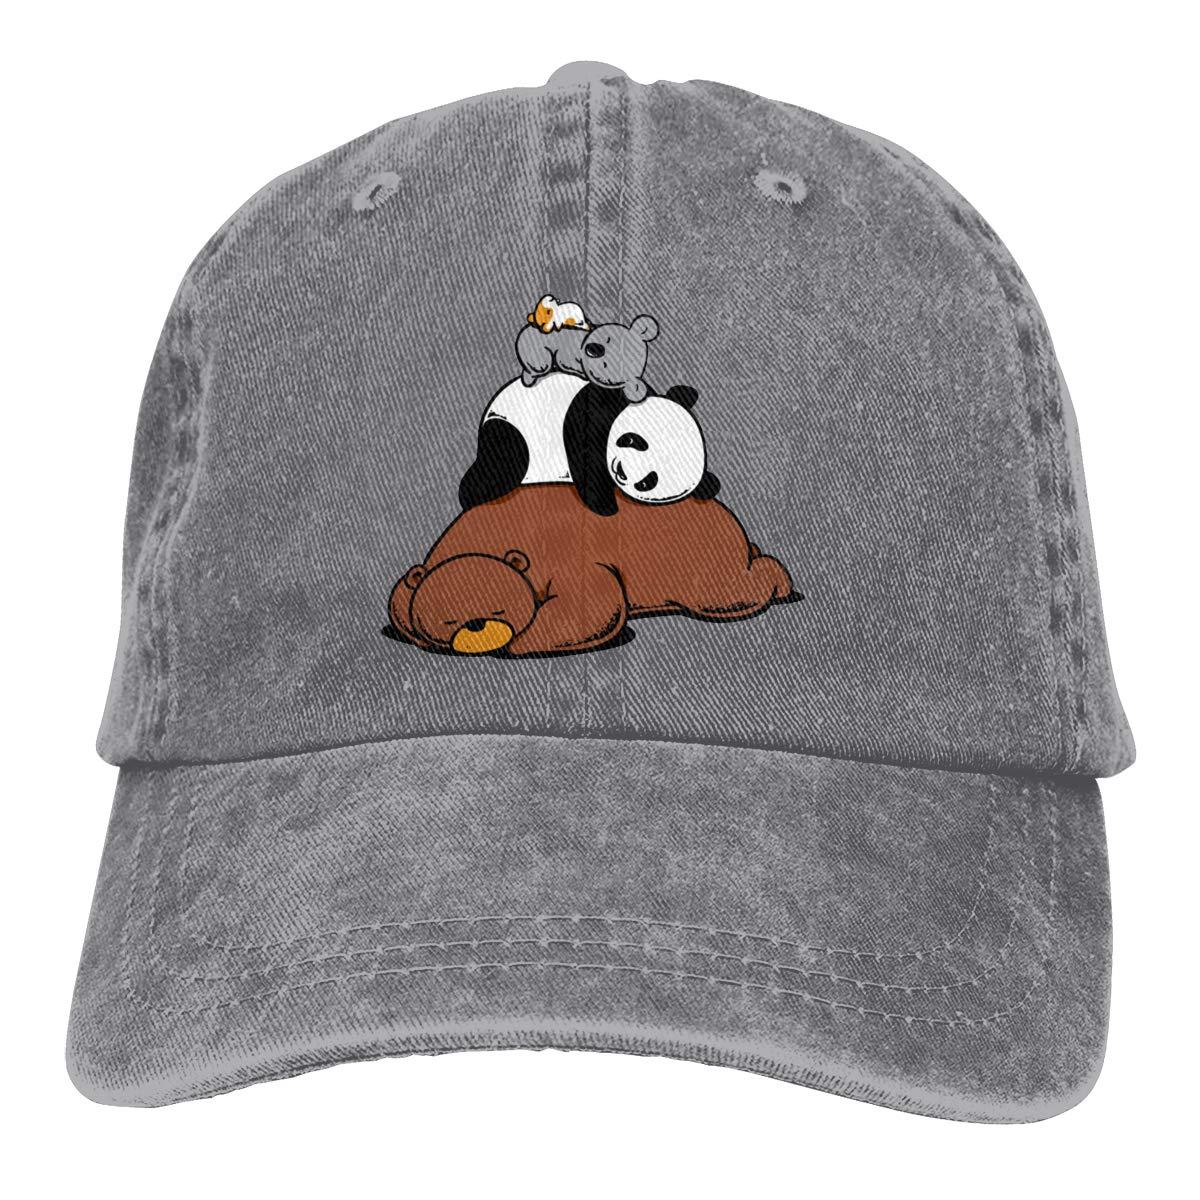 Louis Berry Bär Panda Koala Gorra de béisbol Ajustable, Gorro de ...